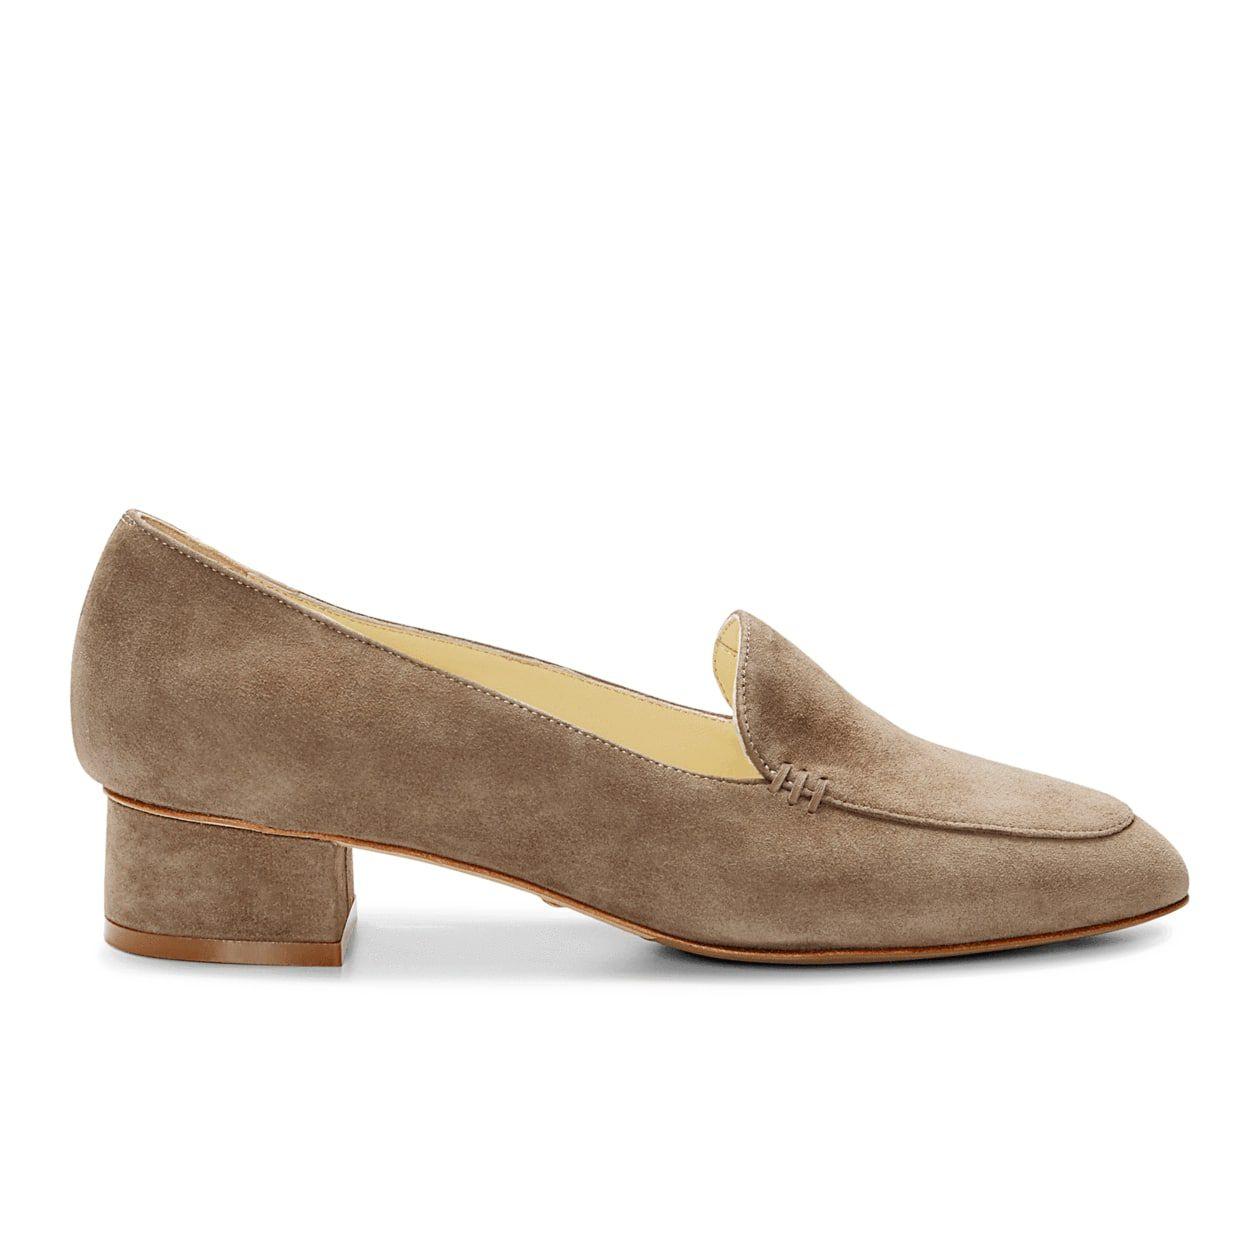 sarah-flint-rosie-heel